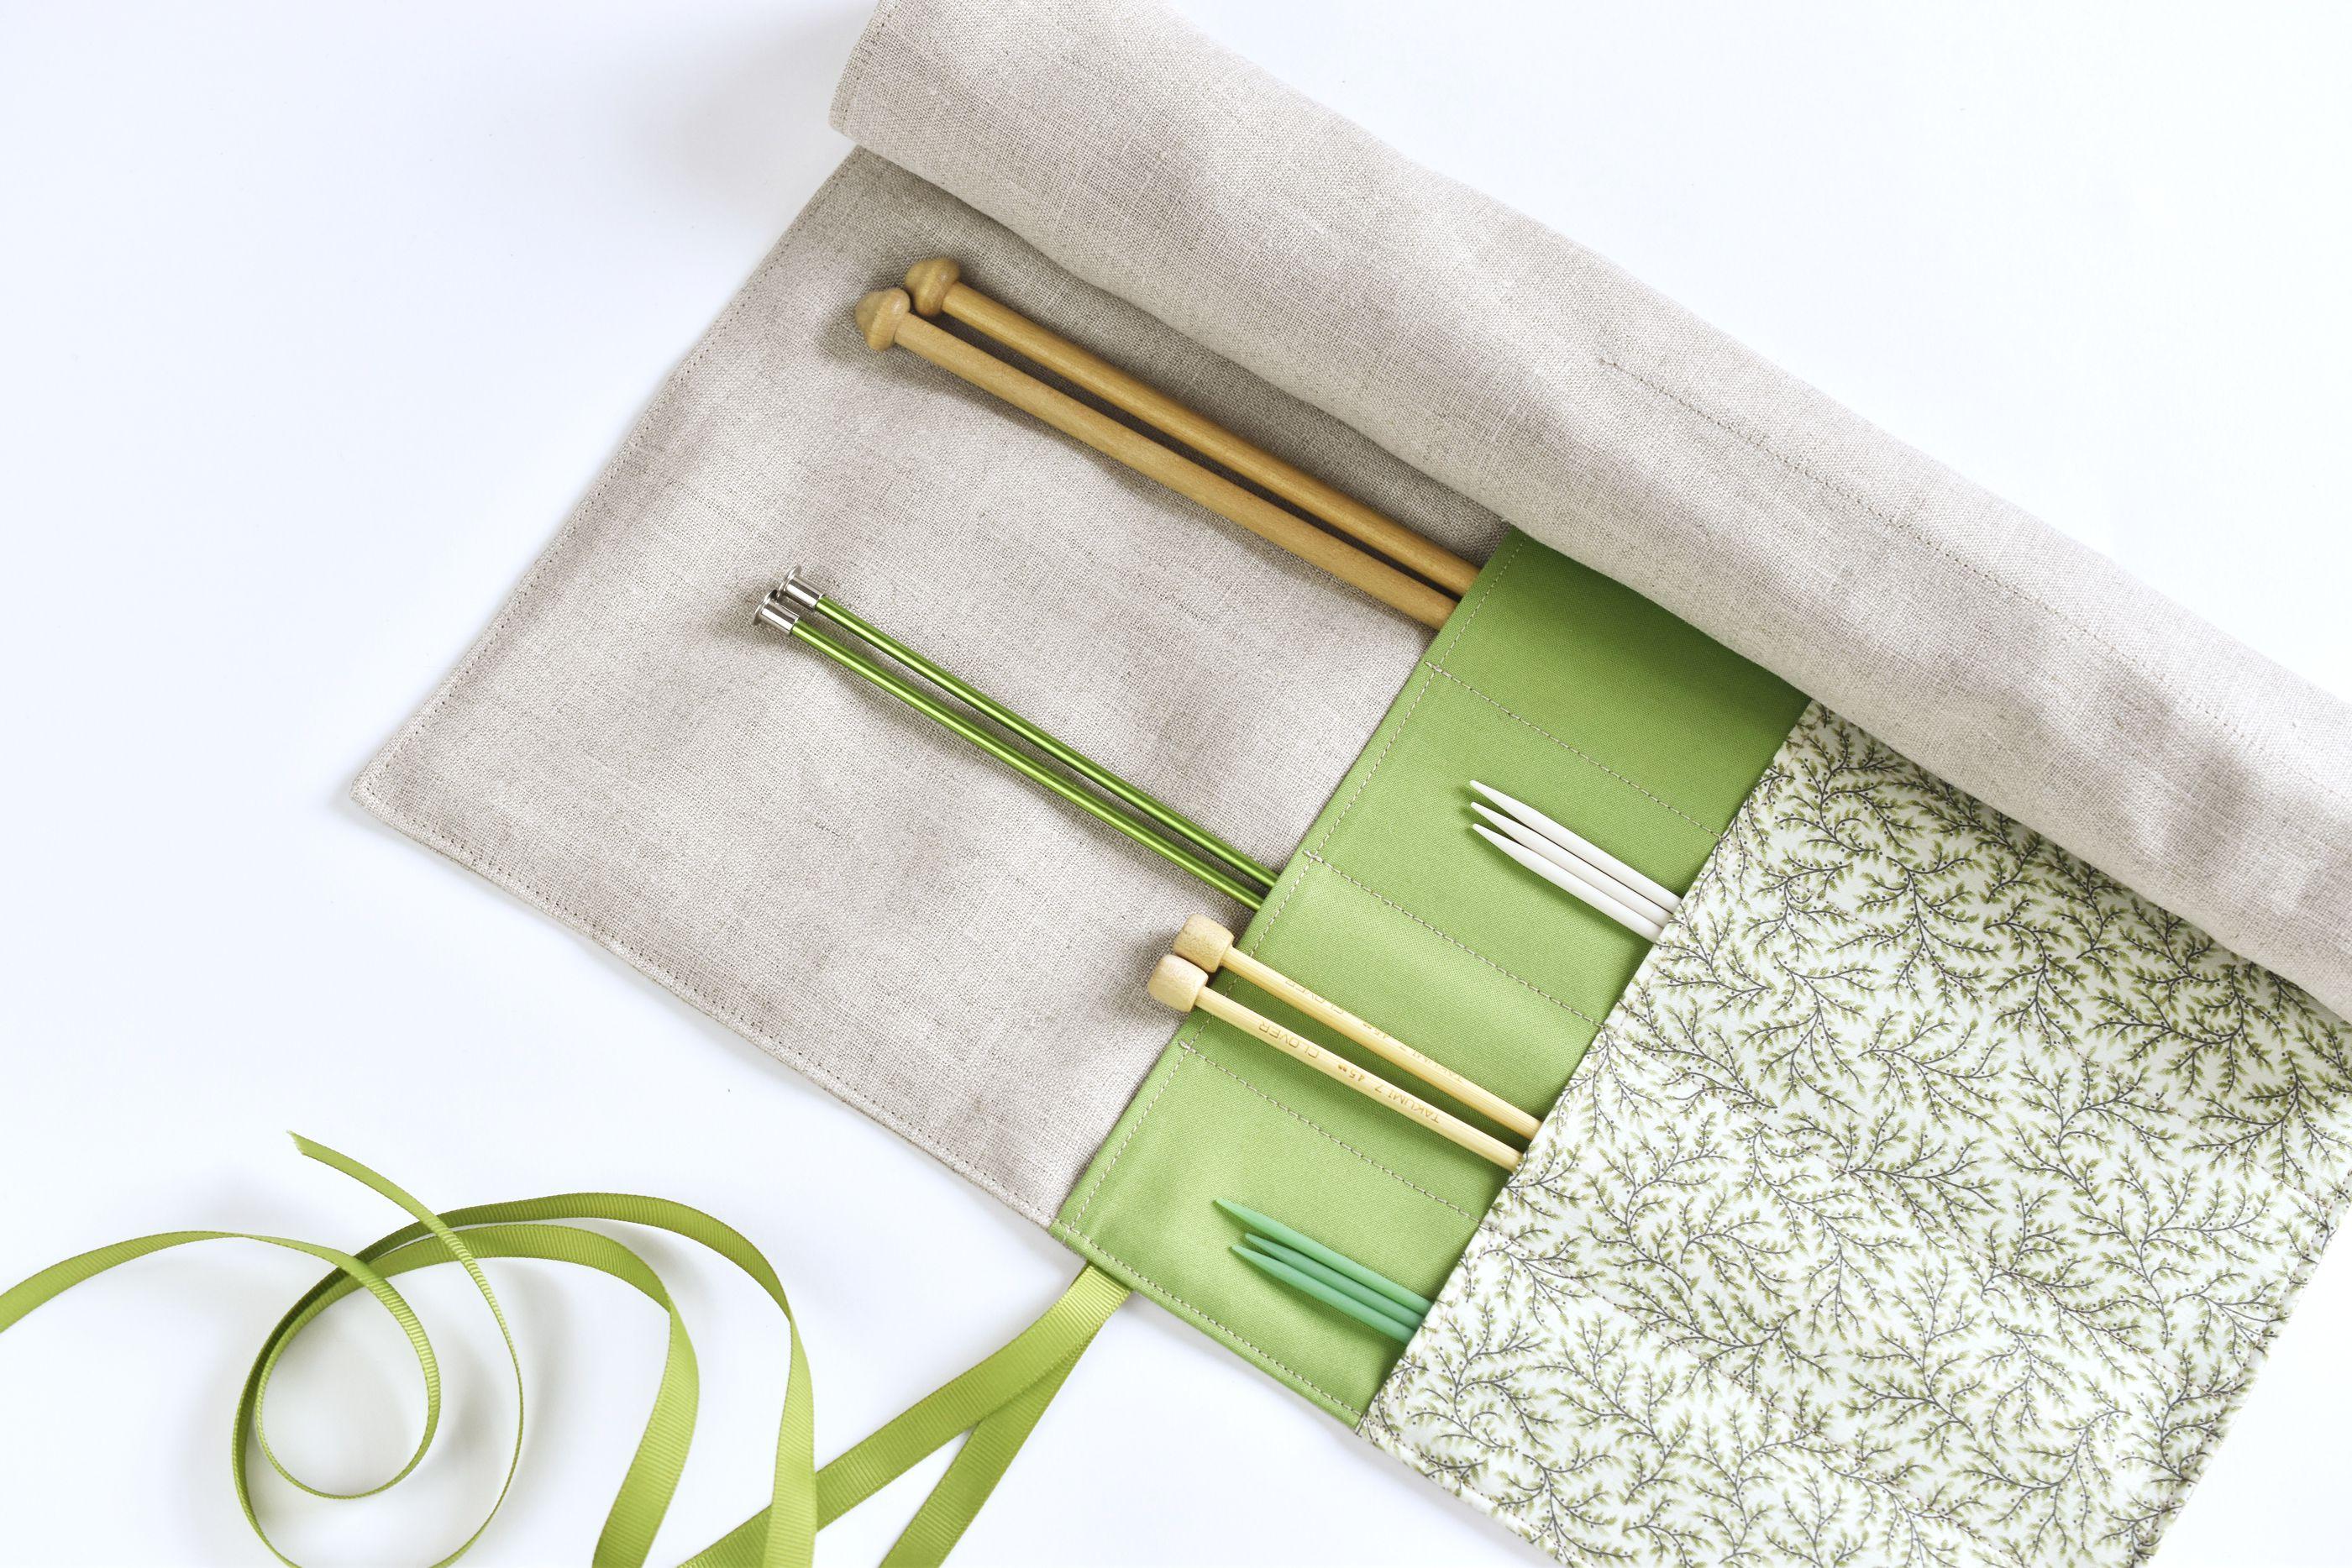 DIY roll-up knitting needle case